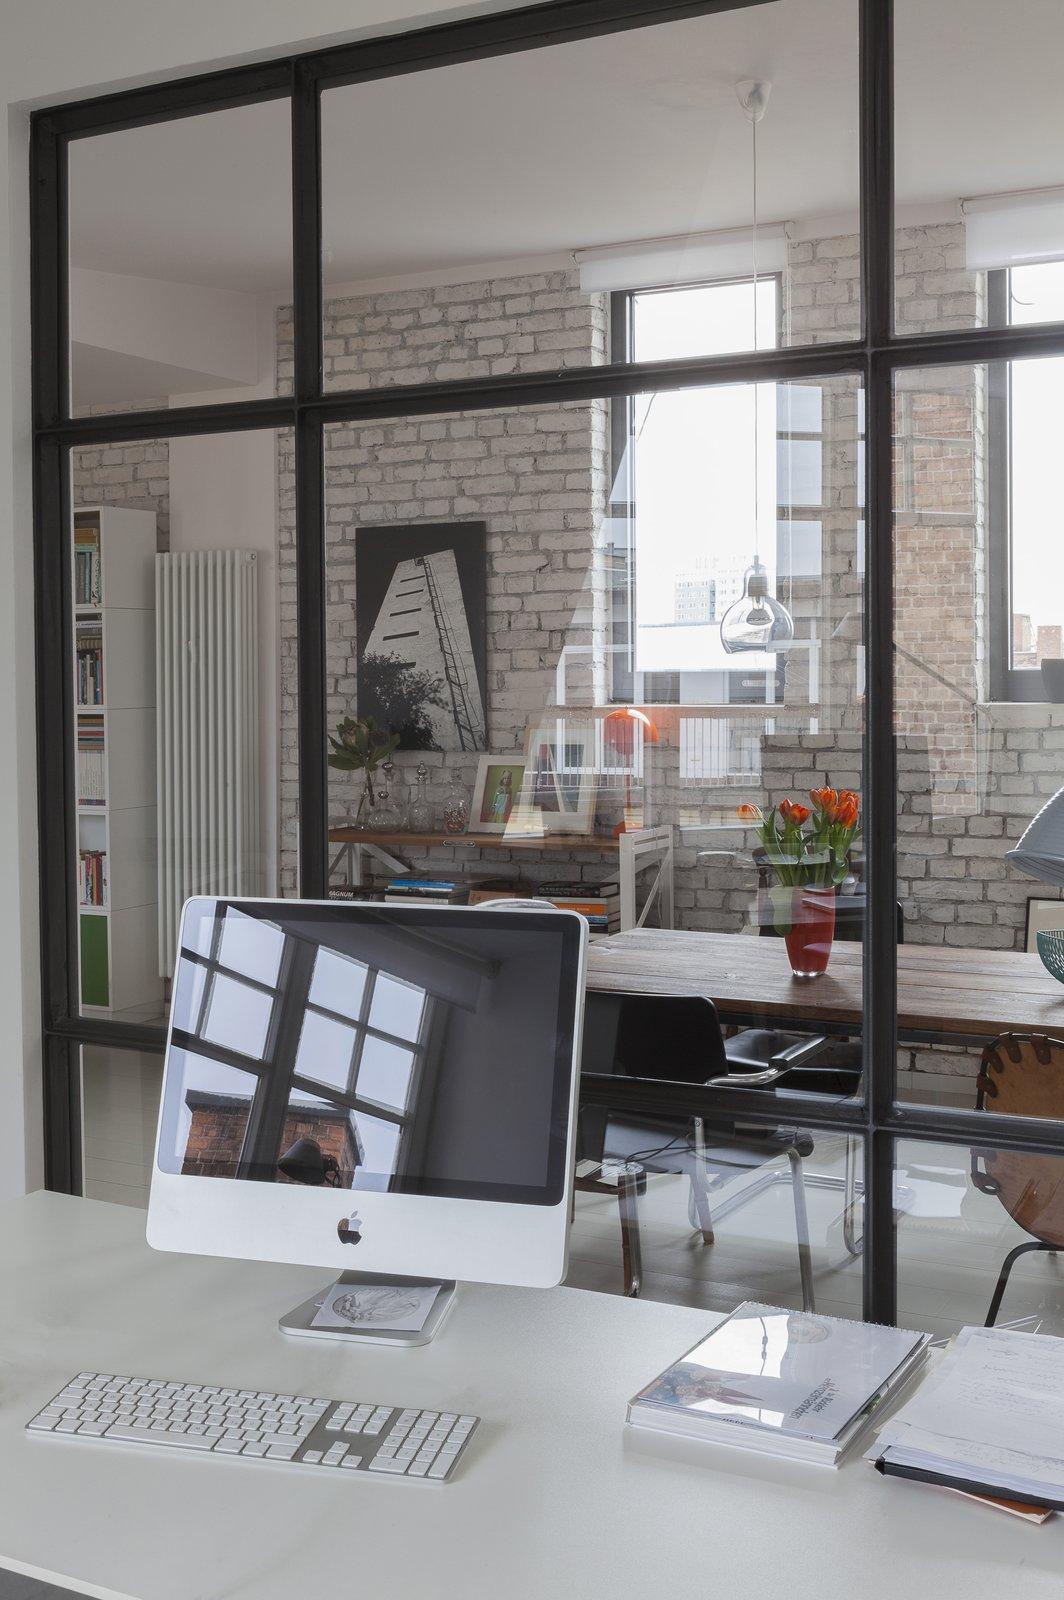 24 Hours Berlin penthouse office